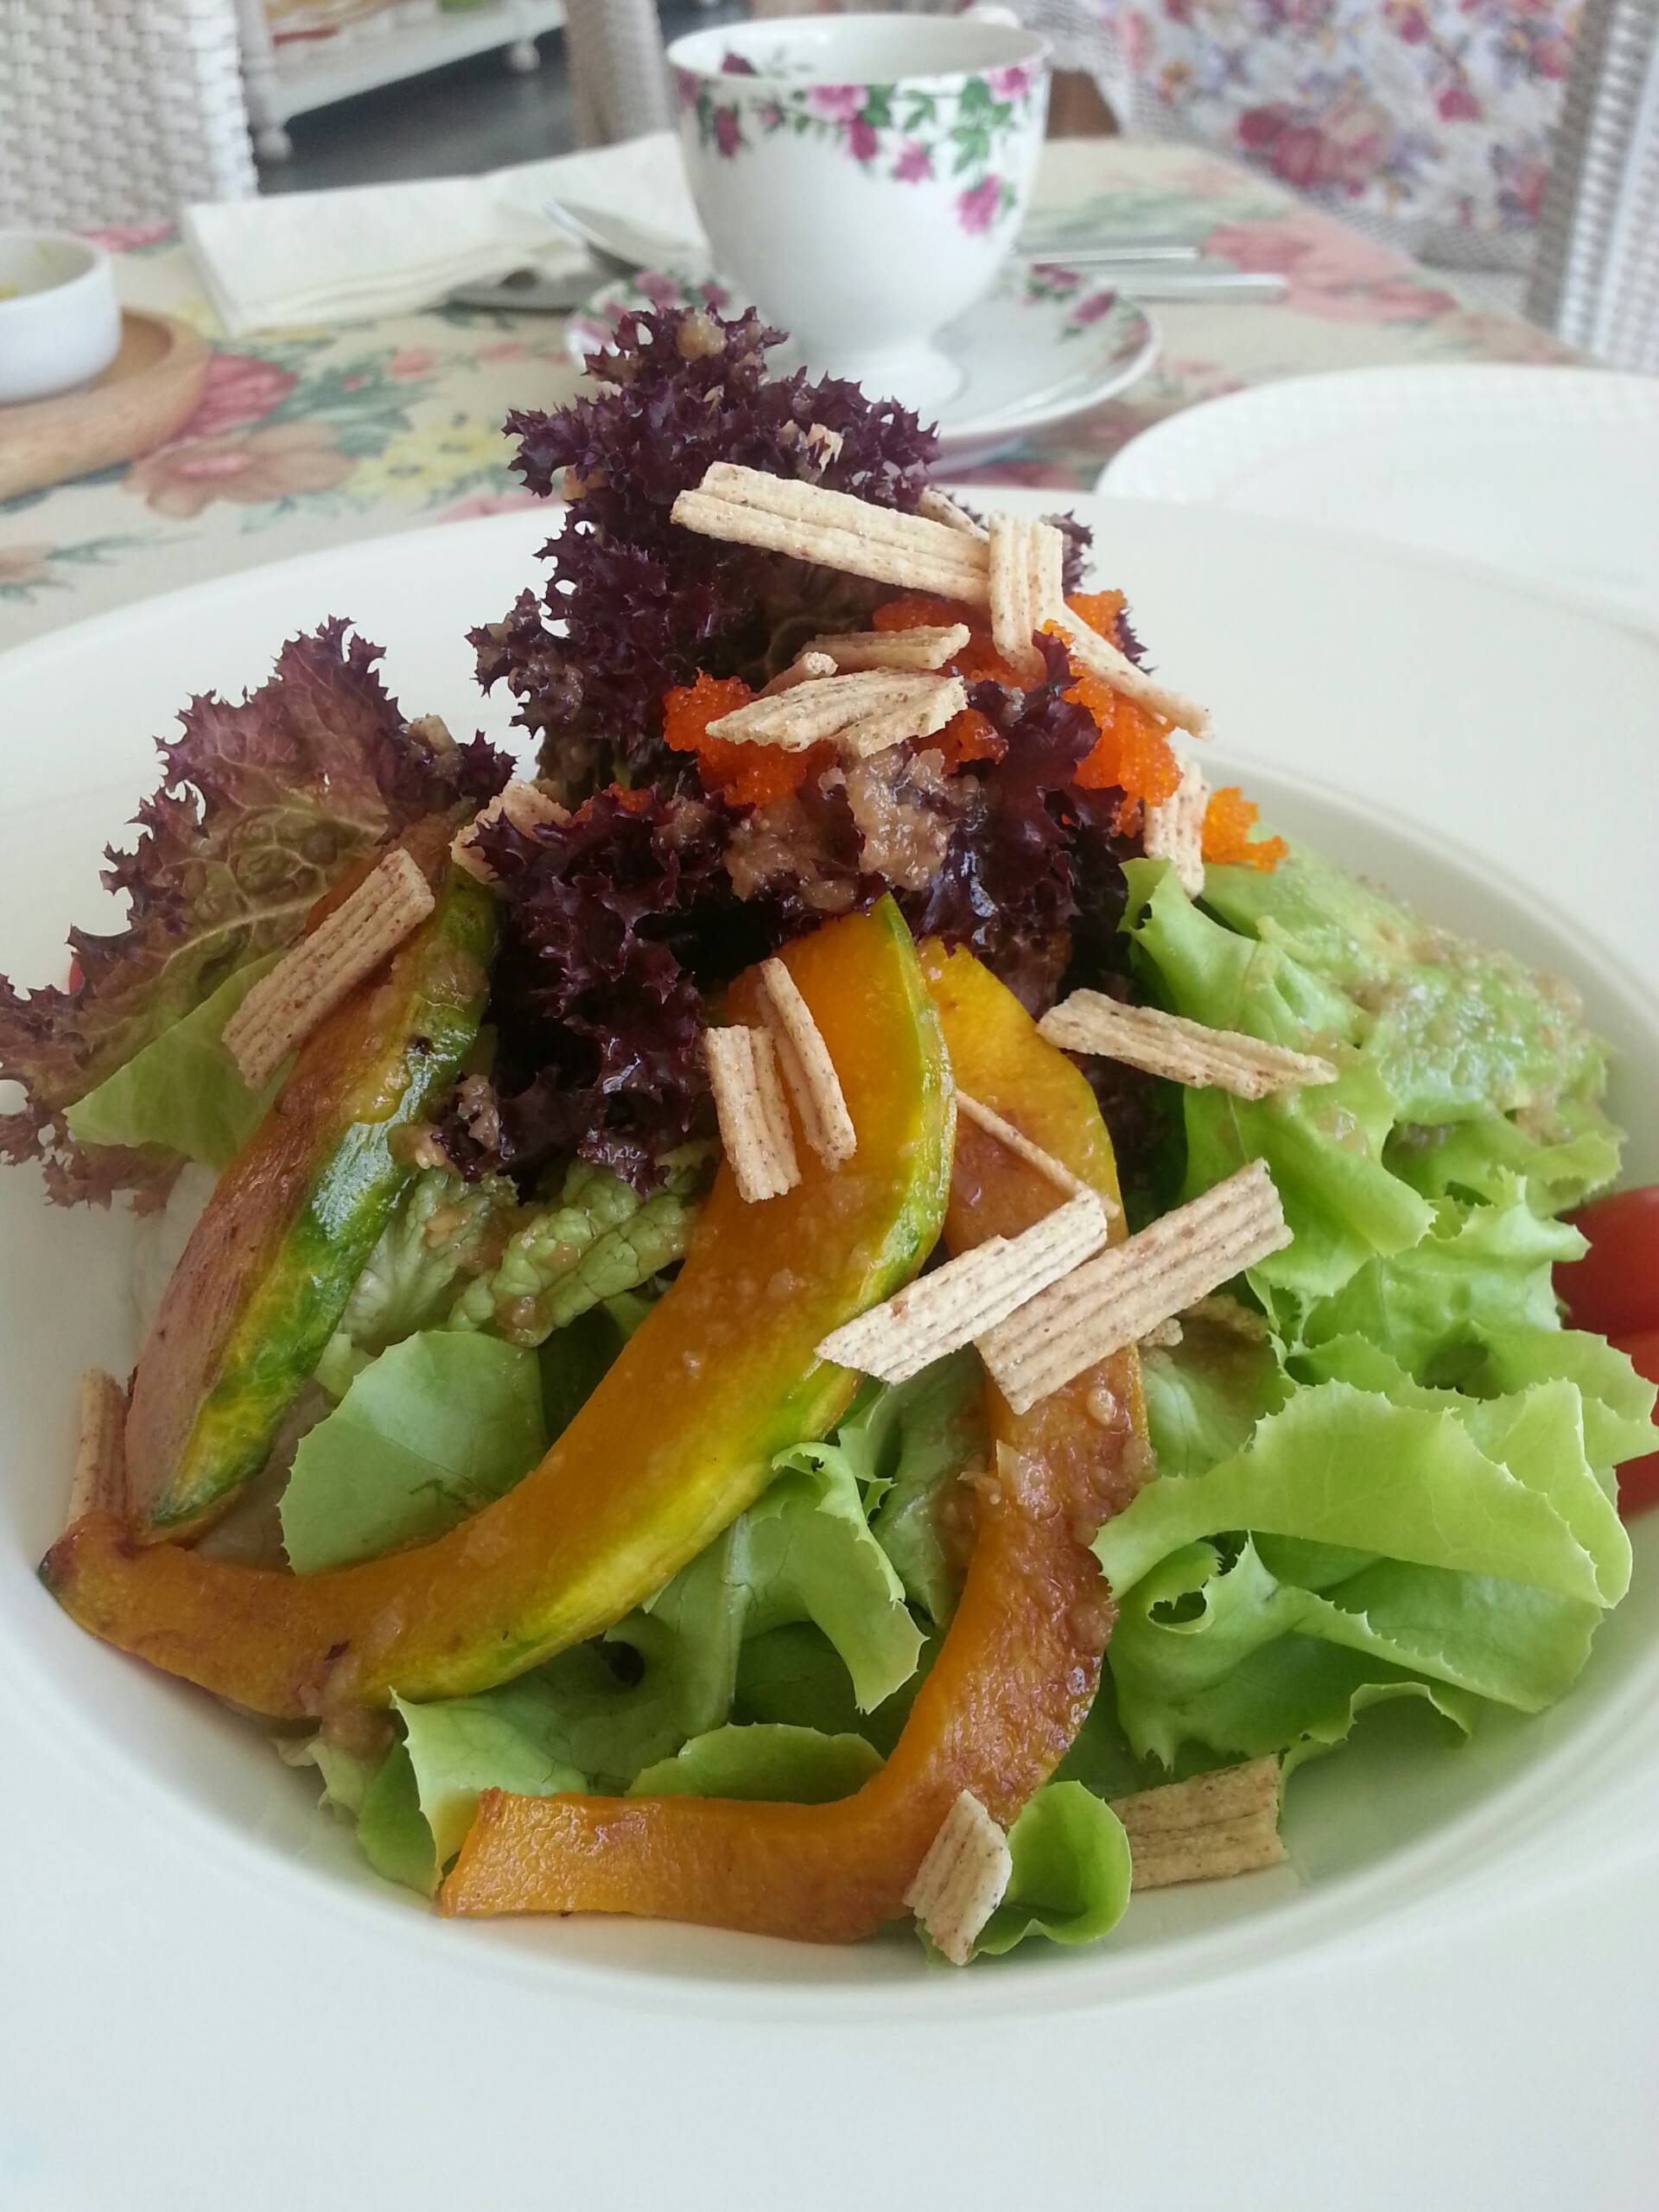 Japanese Salad • ฟักทองอร่อย ที่ ร้านอาหาร Home Fresh Hydrofarm